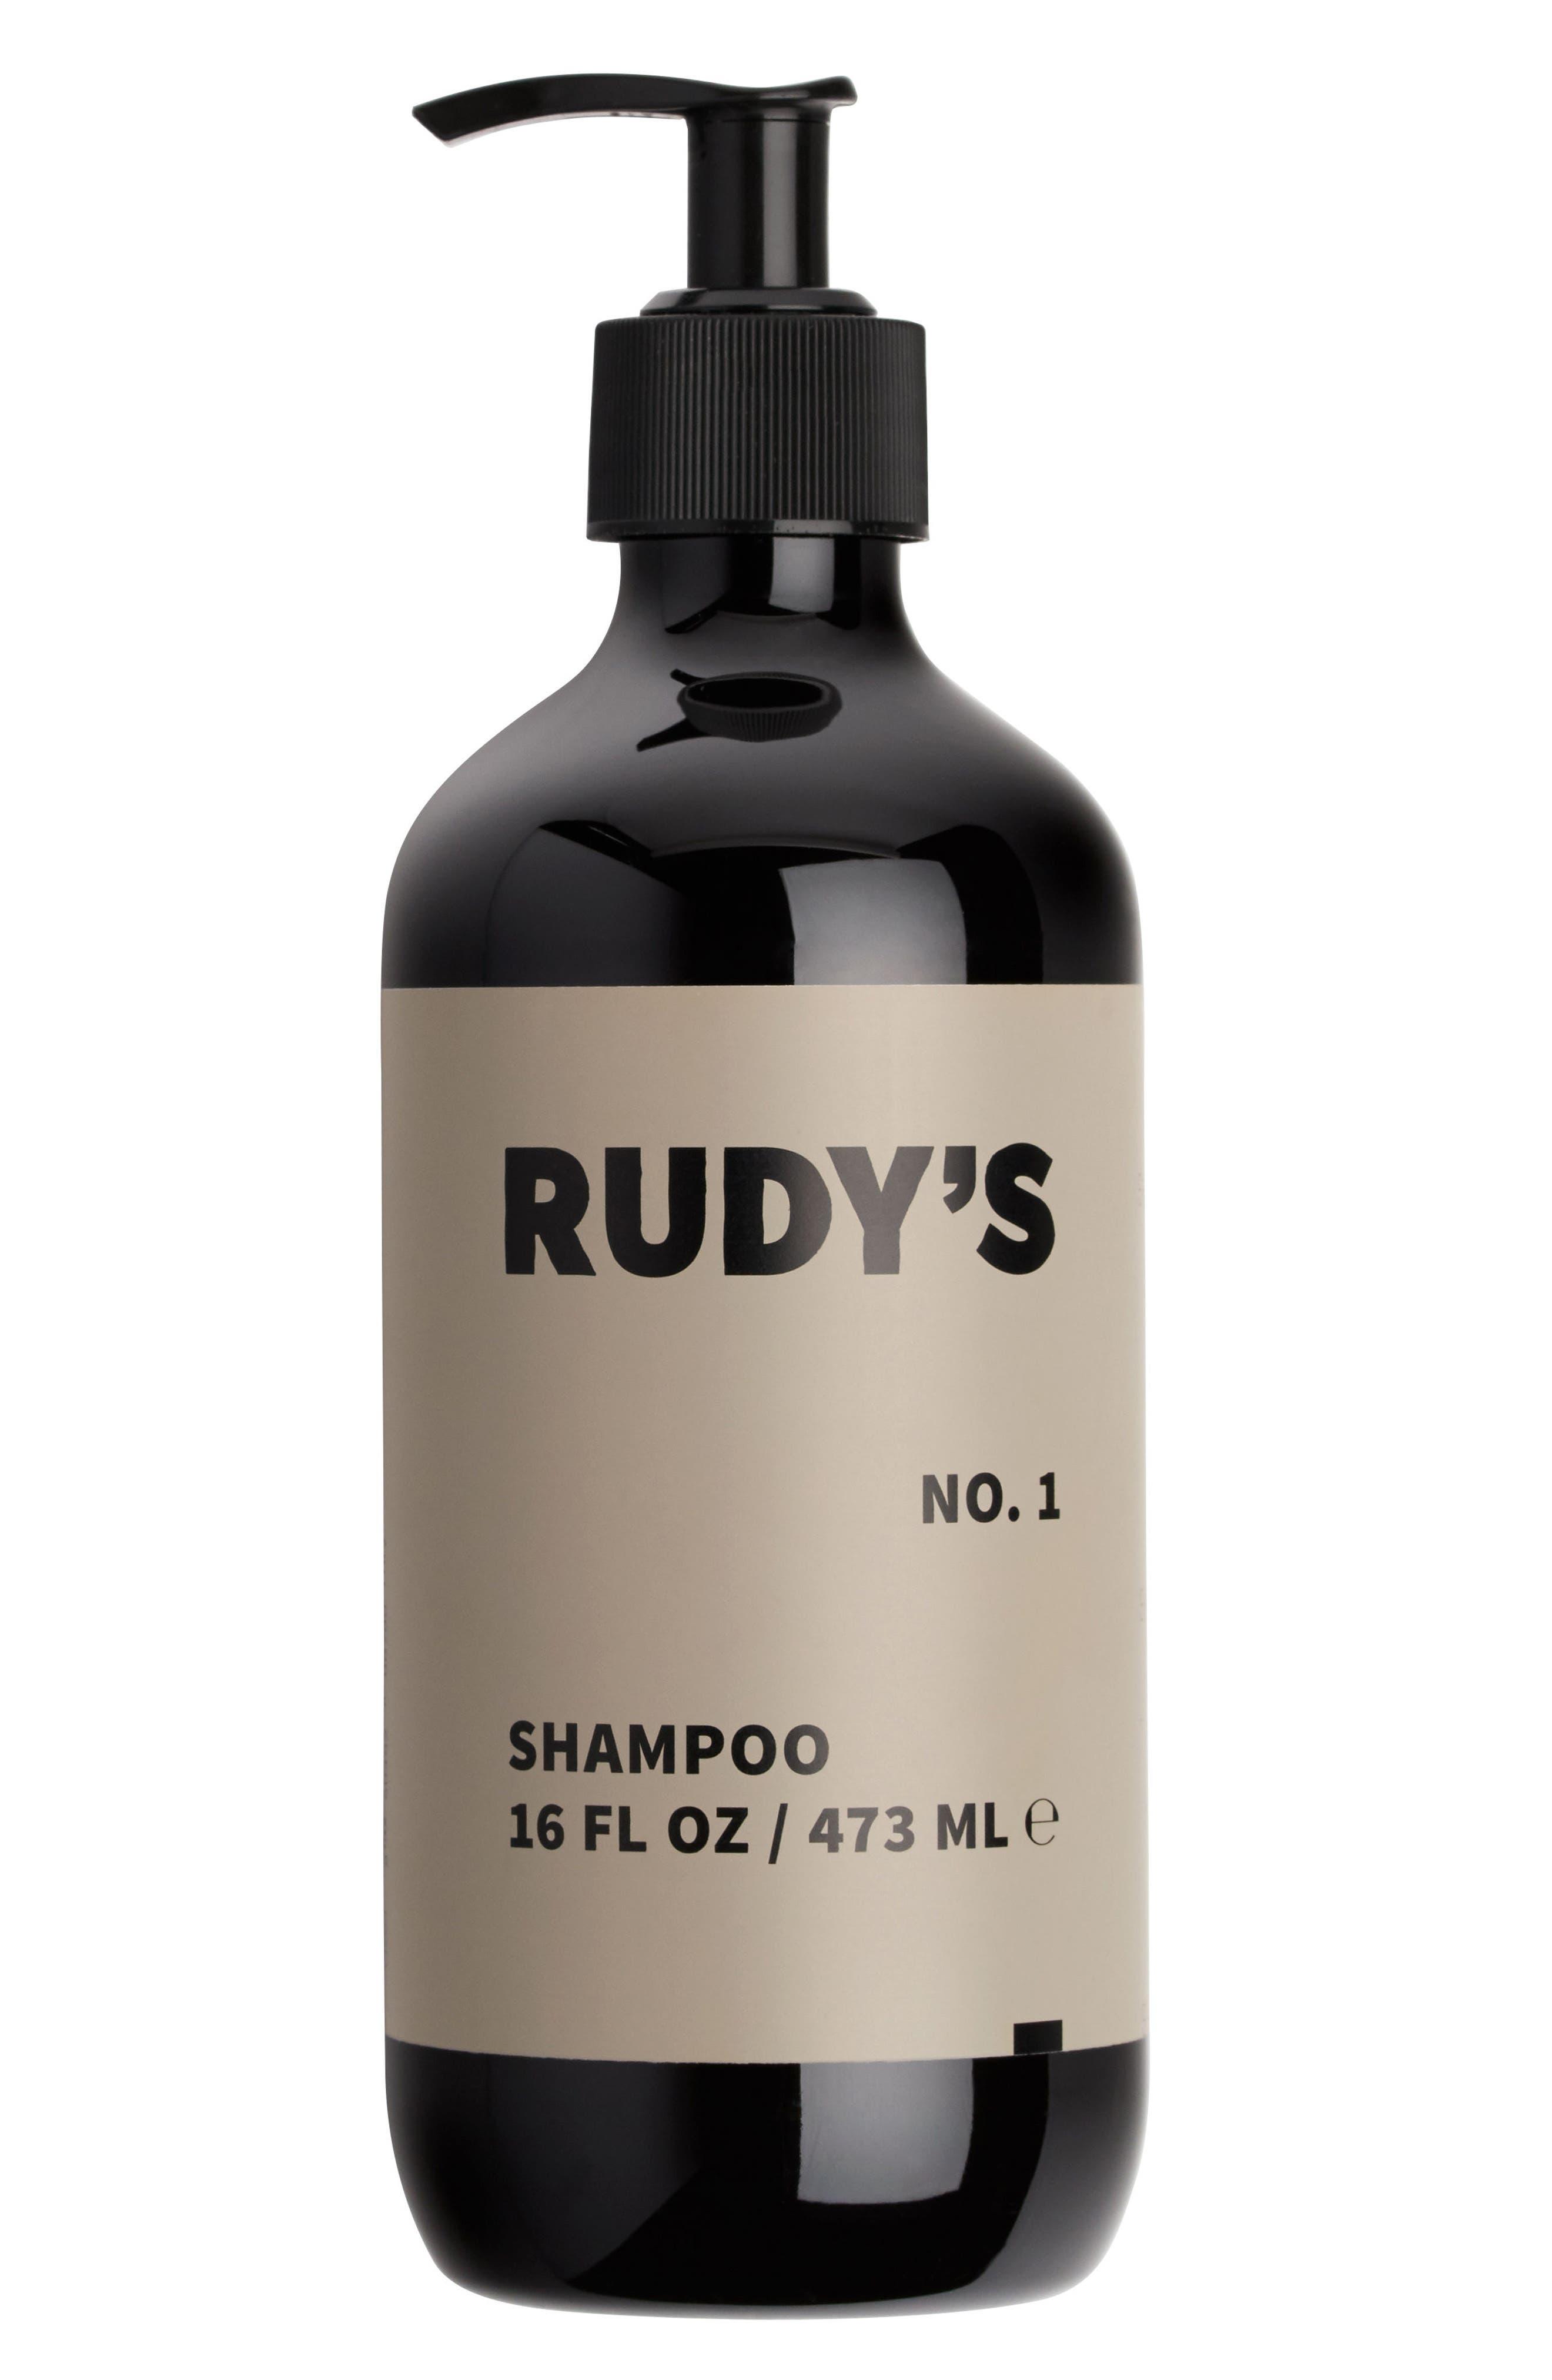 Rudy's Barbershop No. 1 Shampoo